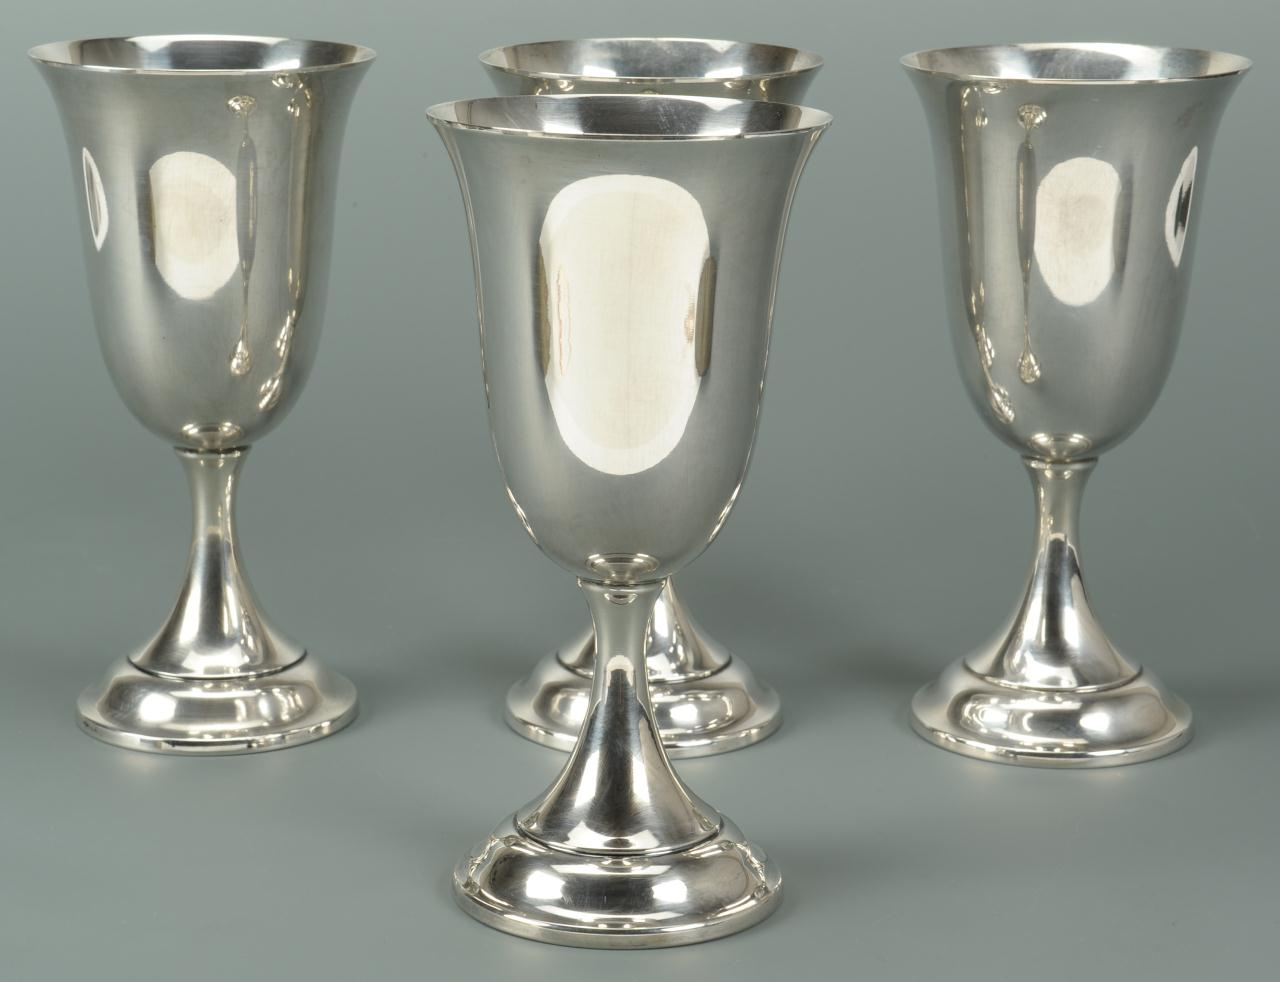 Lot 573: Set of 4 Sterling Water Goblets